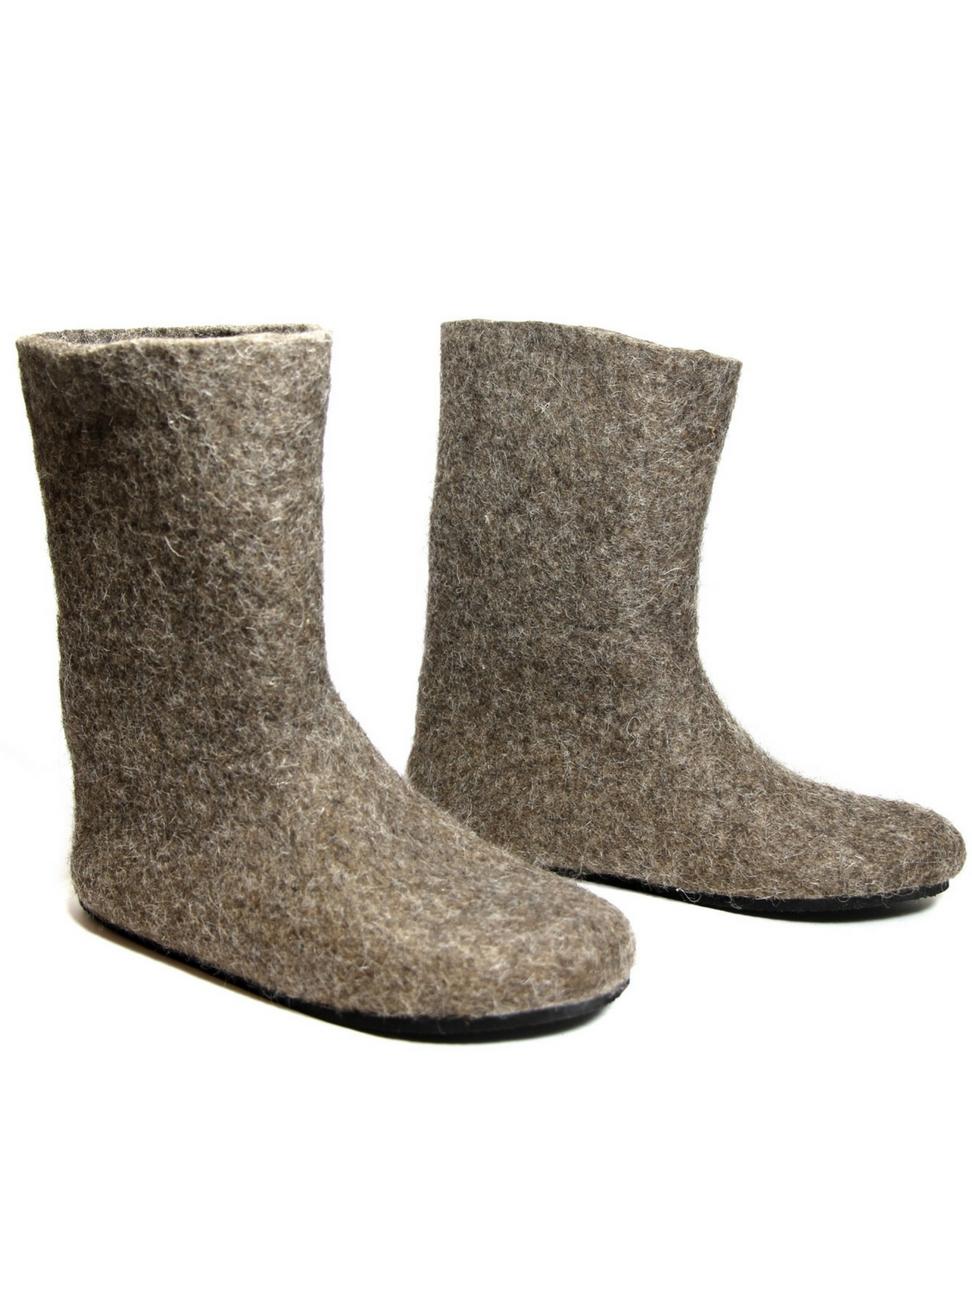 Women's Organic Wool Felt Boots FELT FORMA.jpg